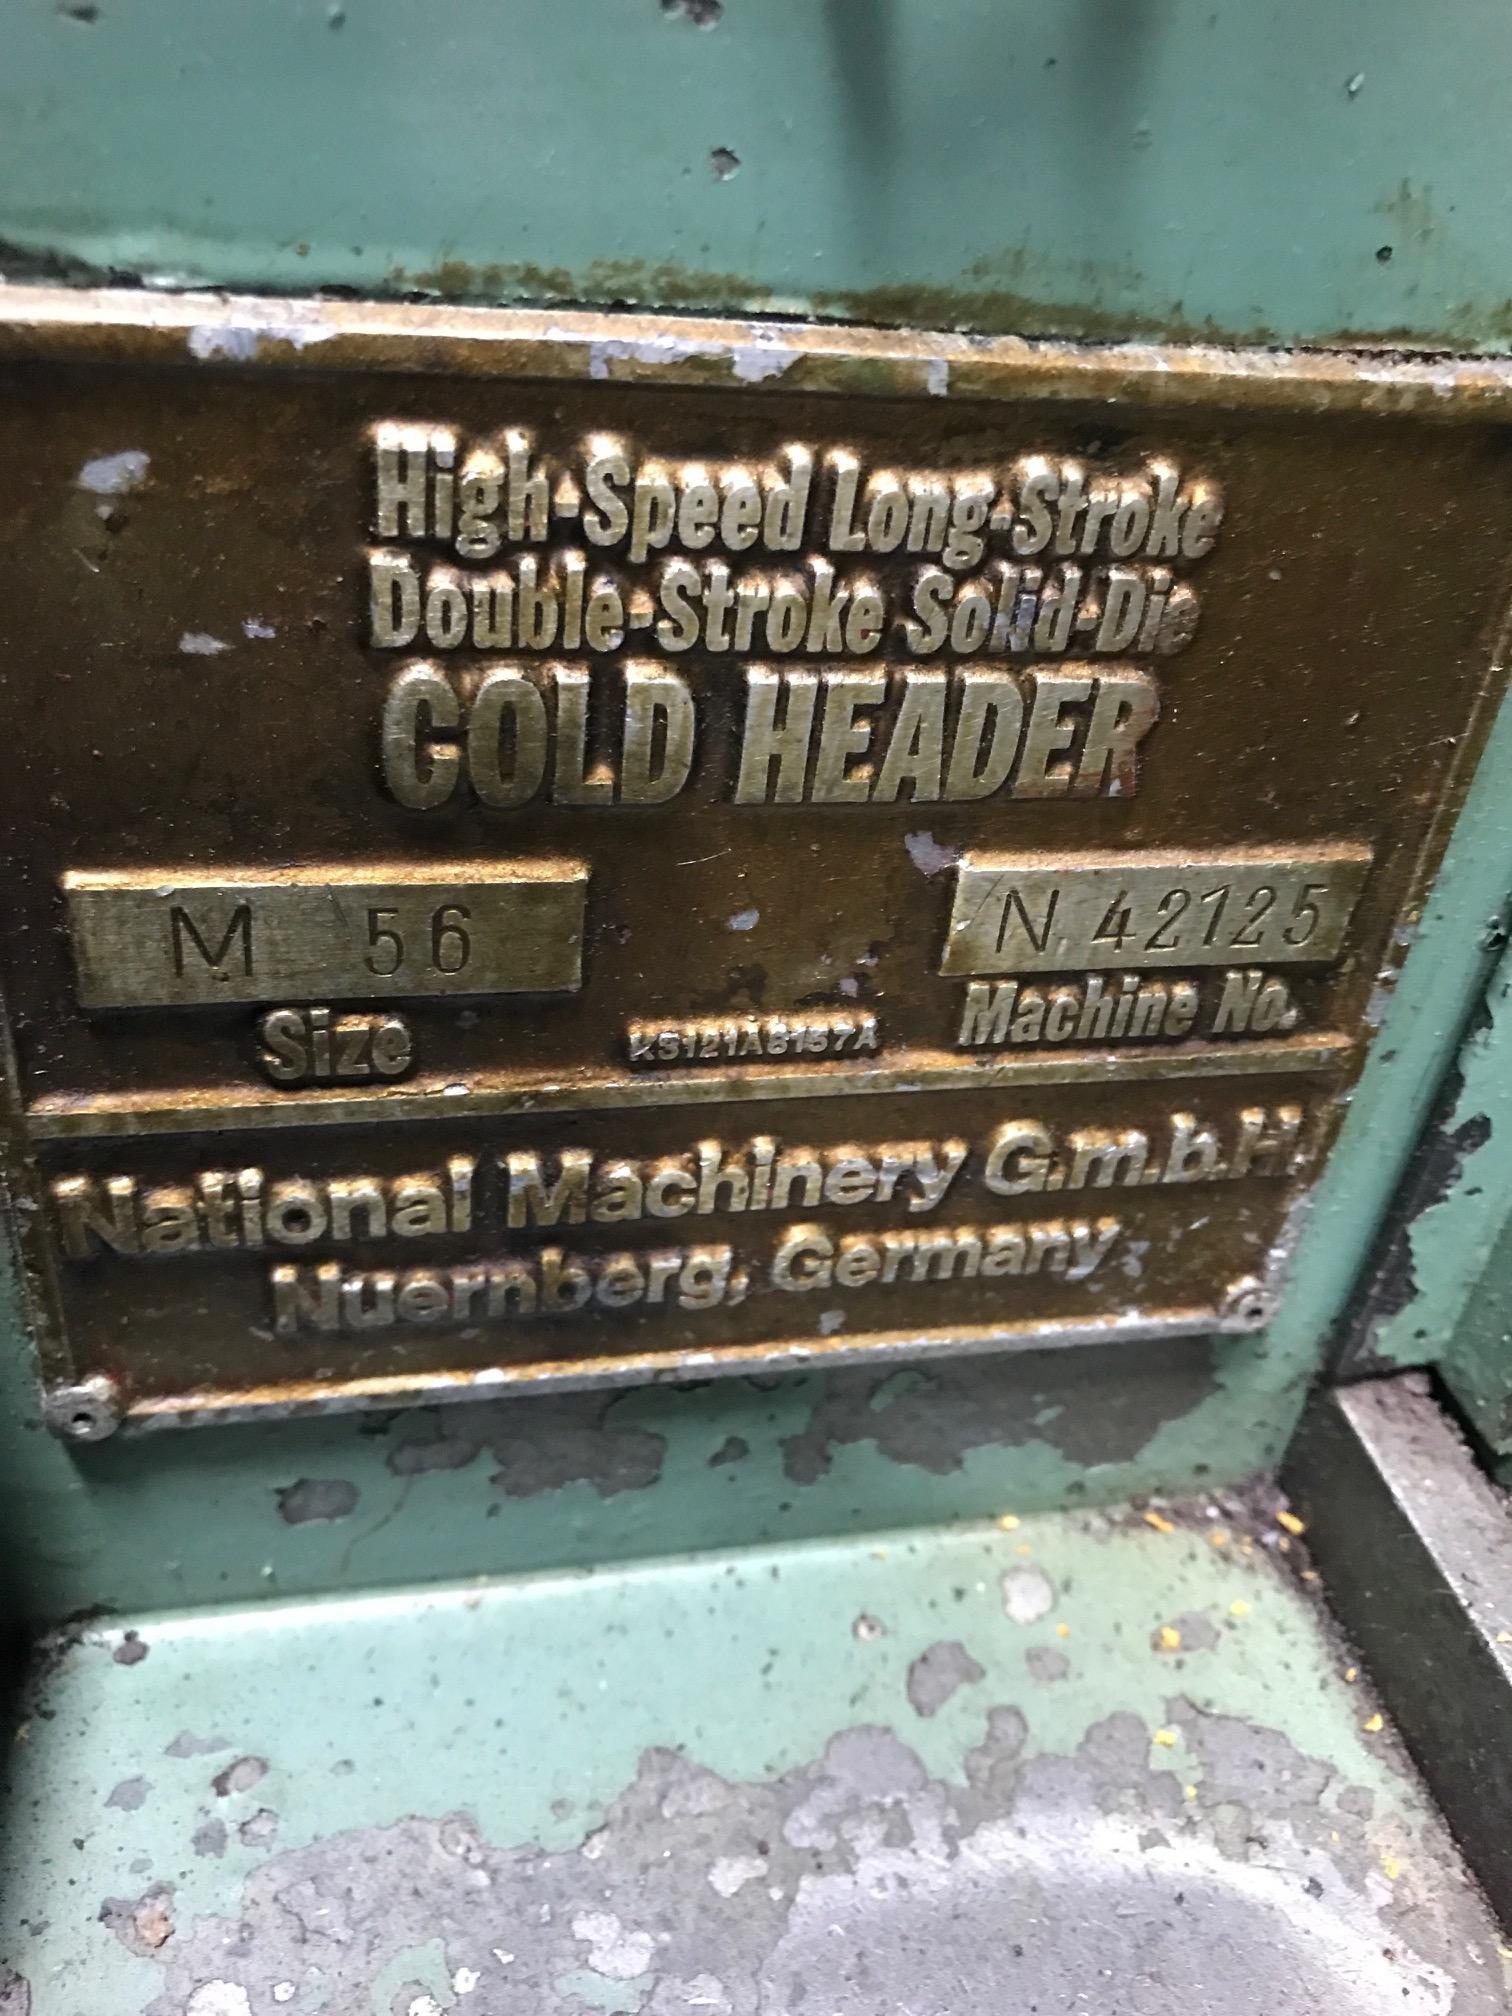 "1/4"" National Model M56 High Speed Long Stroke DSSD  Cold Header"